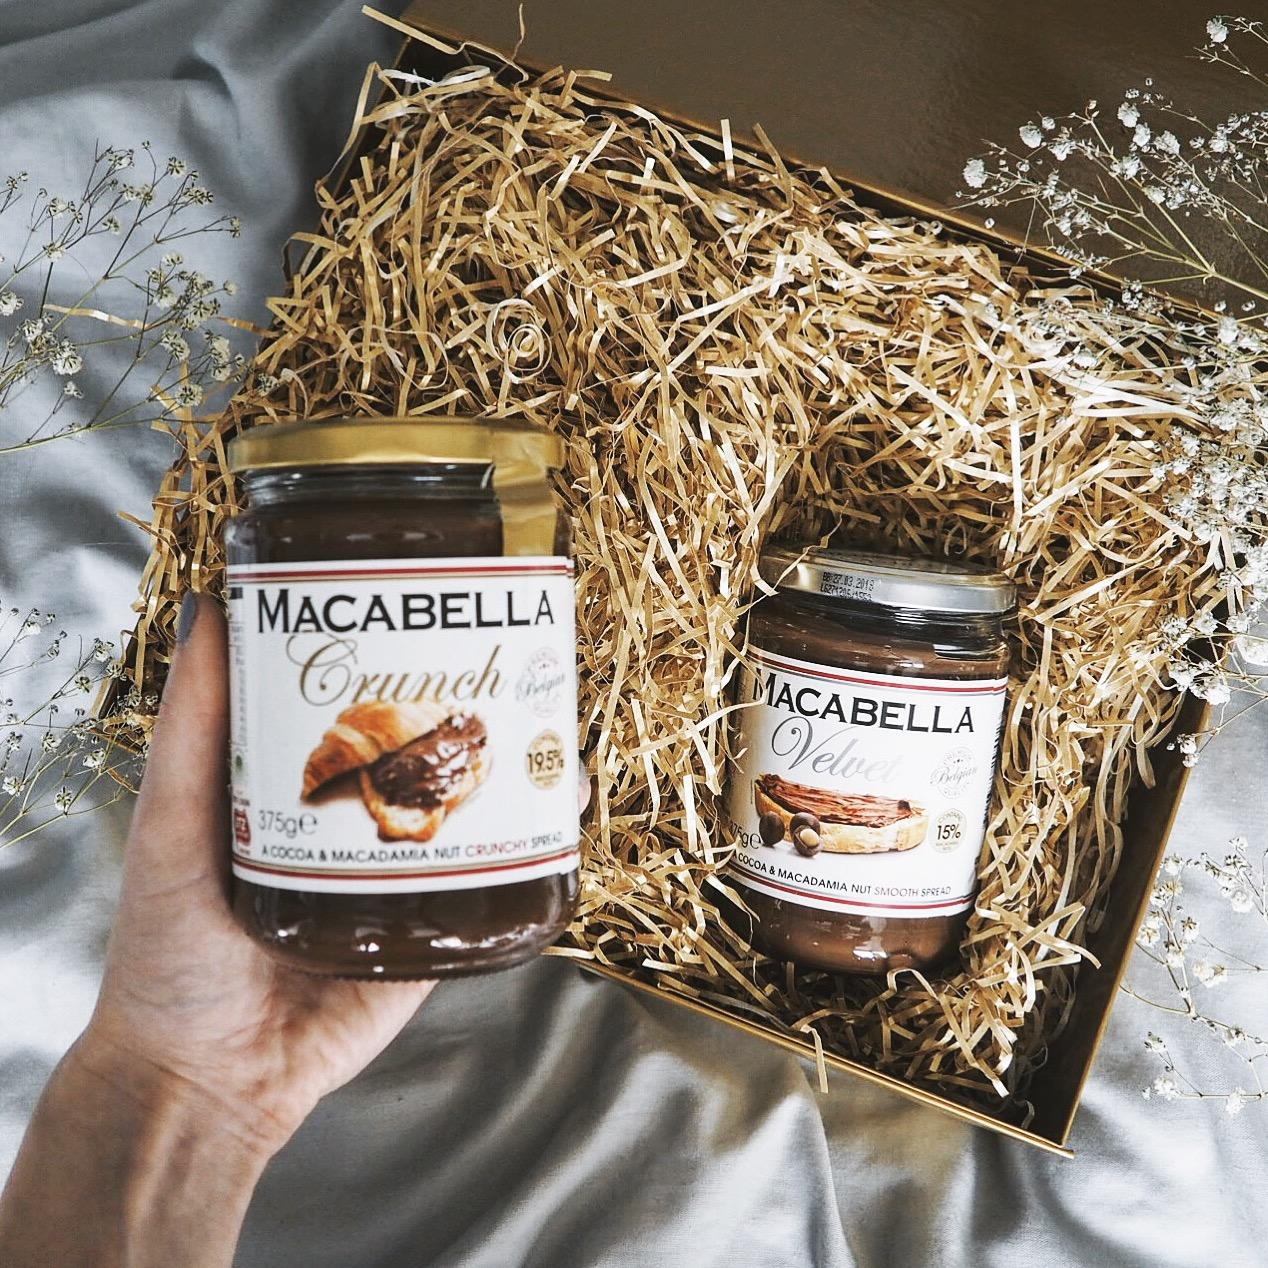 macabella chocolate spread, chocolate hazelnut spread, chocolate spread recipe, macabella, chocolate spread